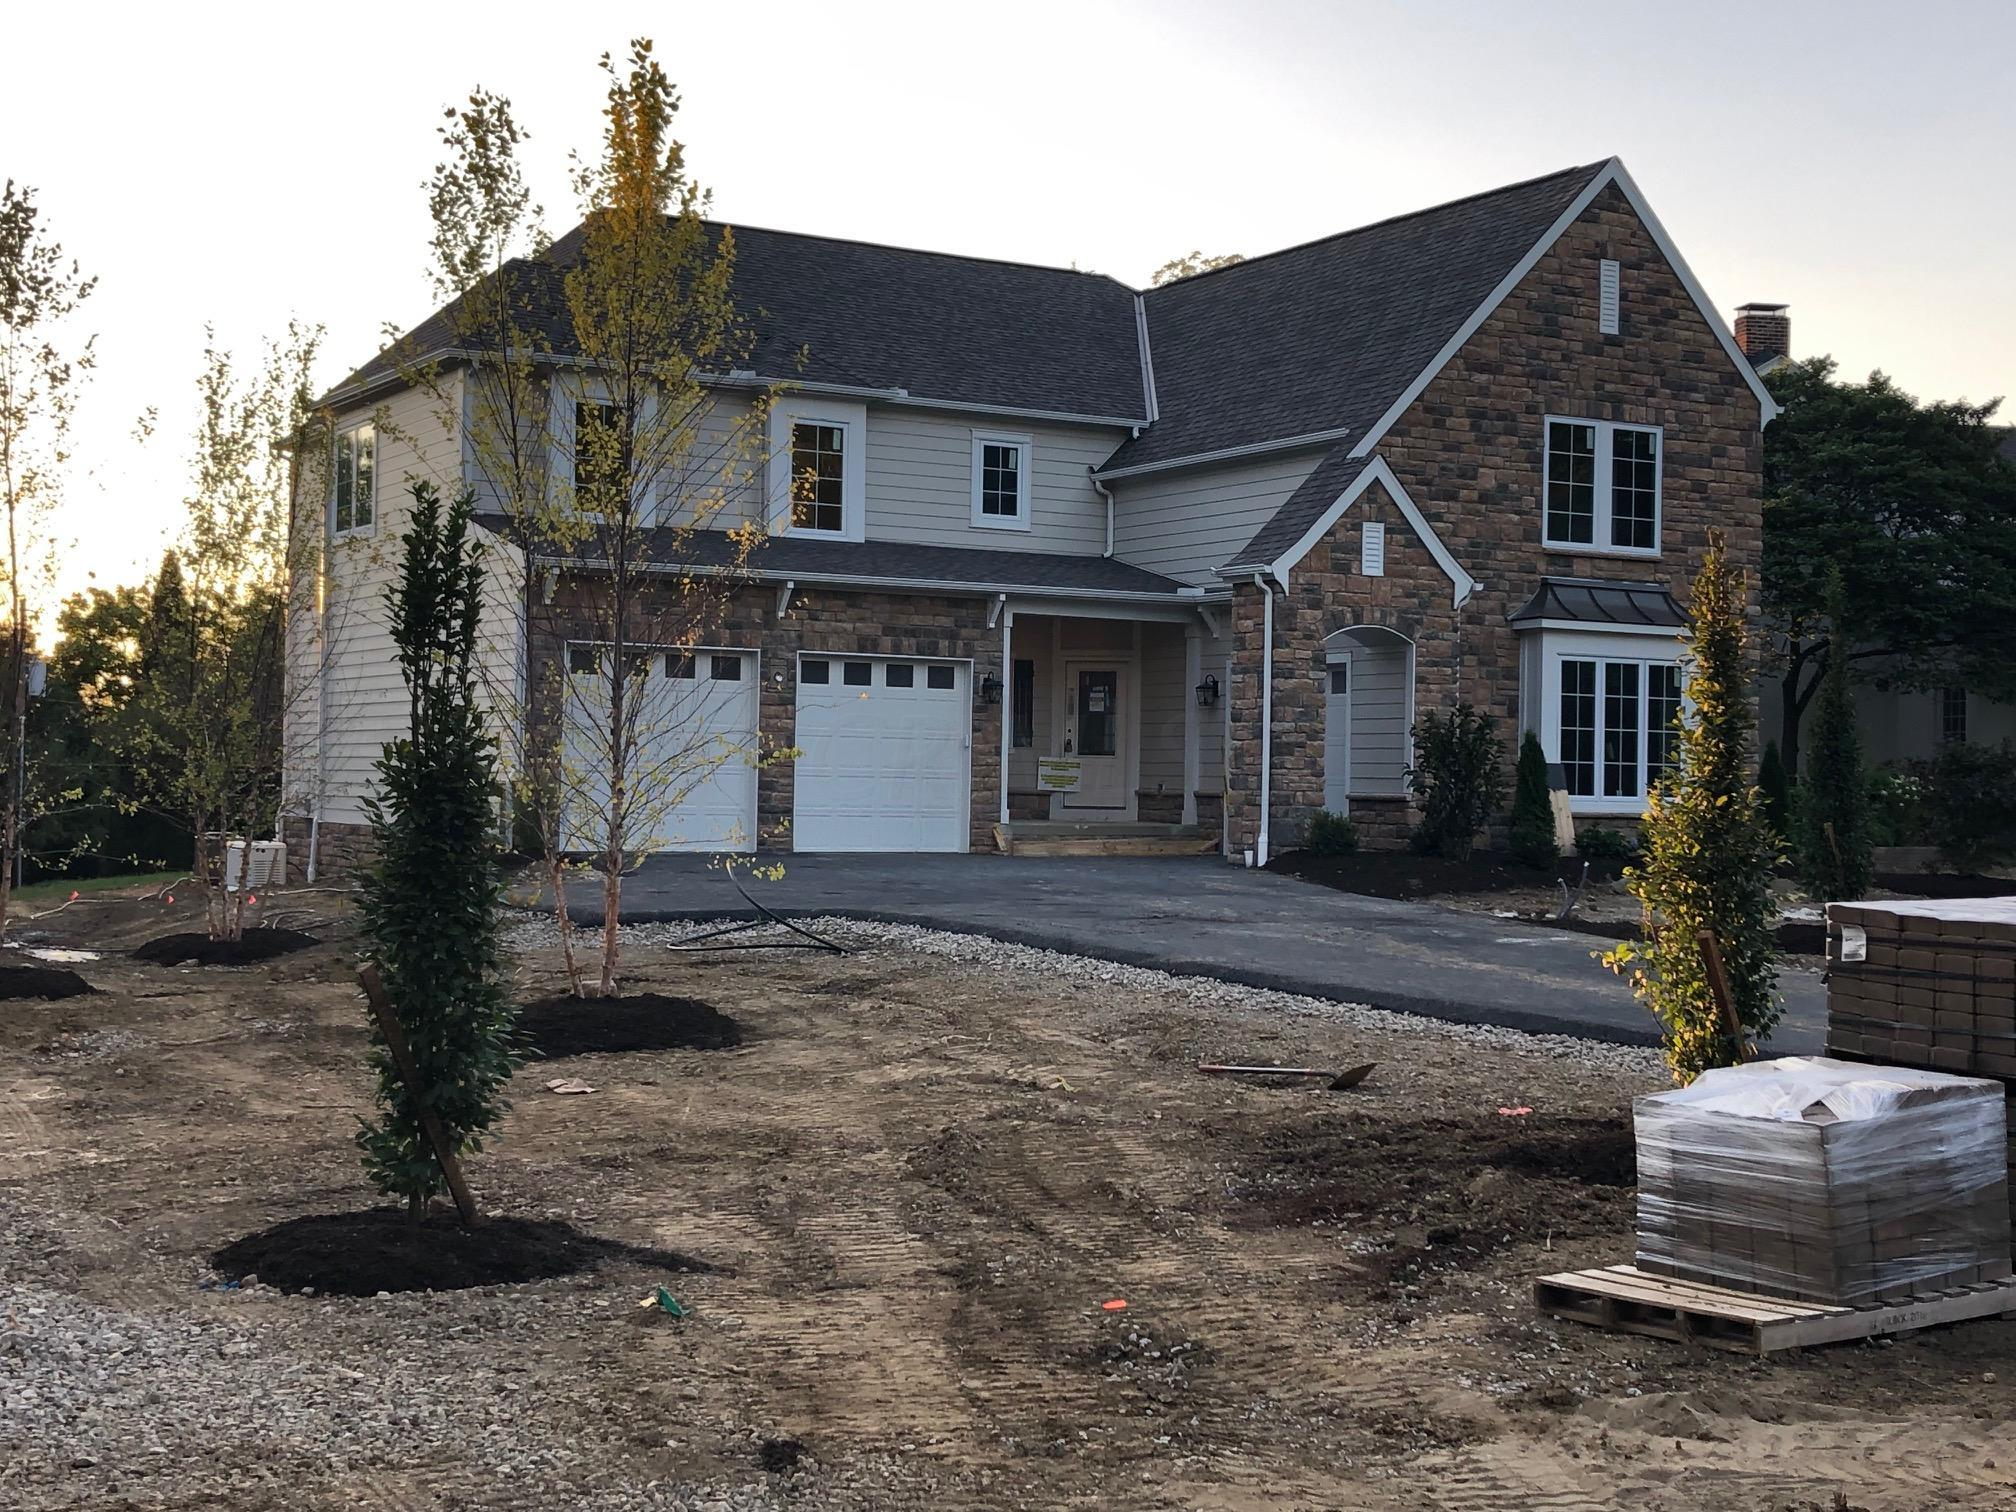 Photo of 4099 Clairmont Road, Columbus, OH 43220